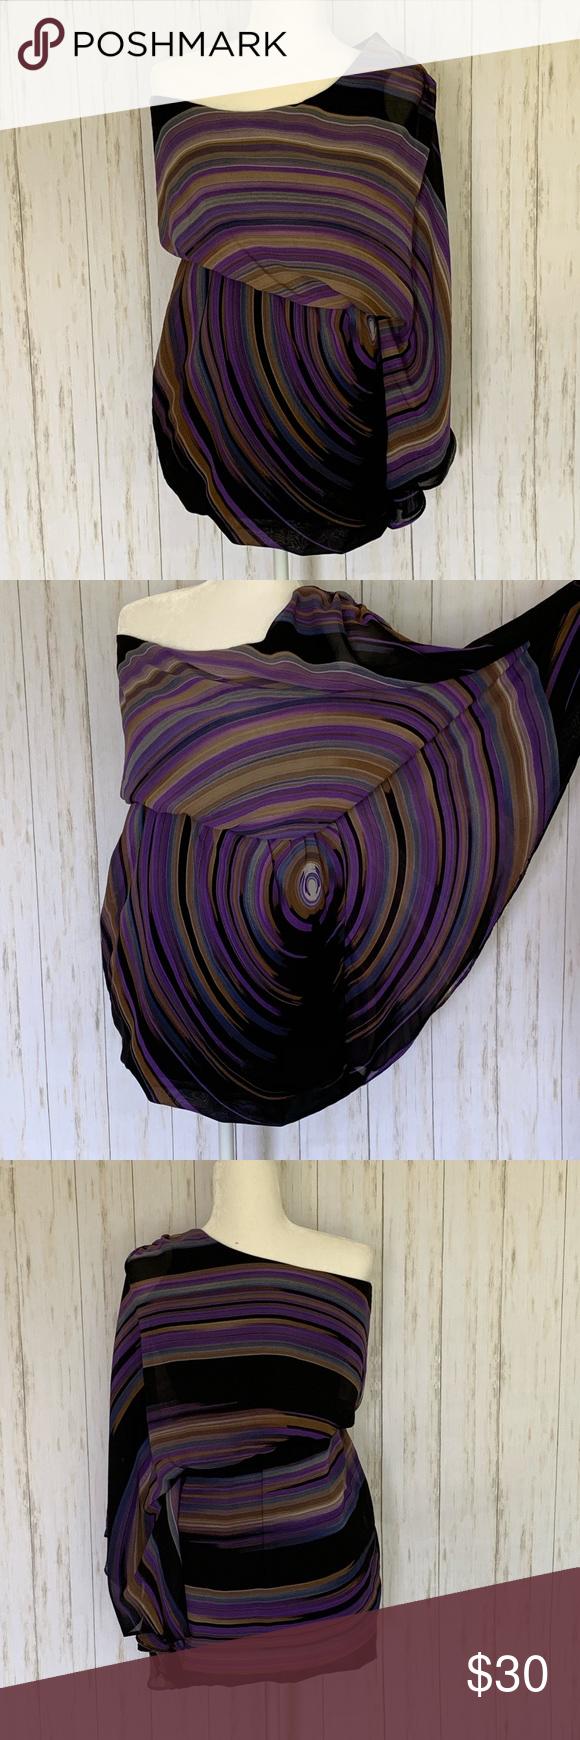 16+ Asos purple one shoulder dress trends